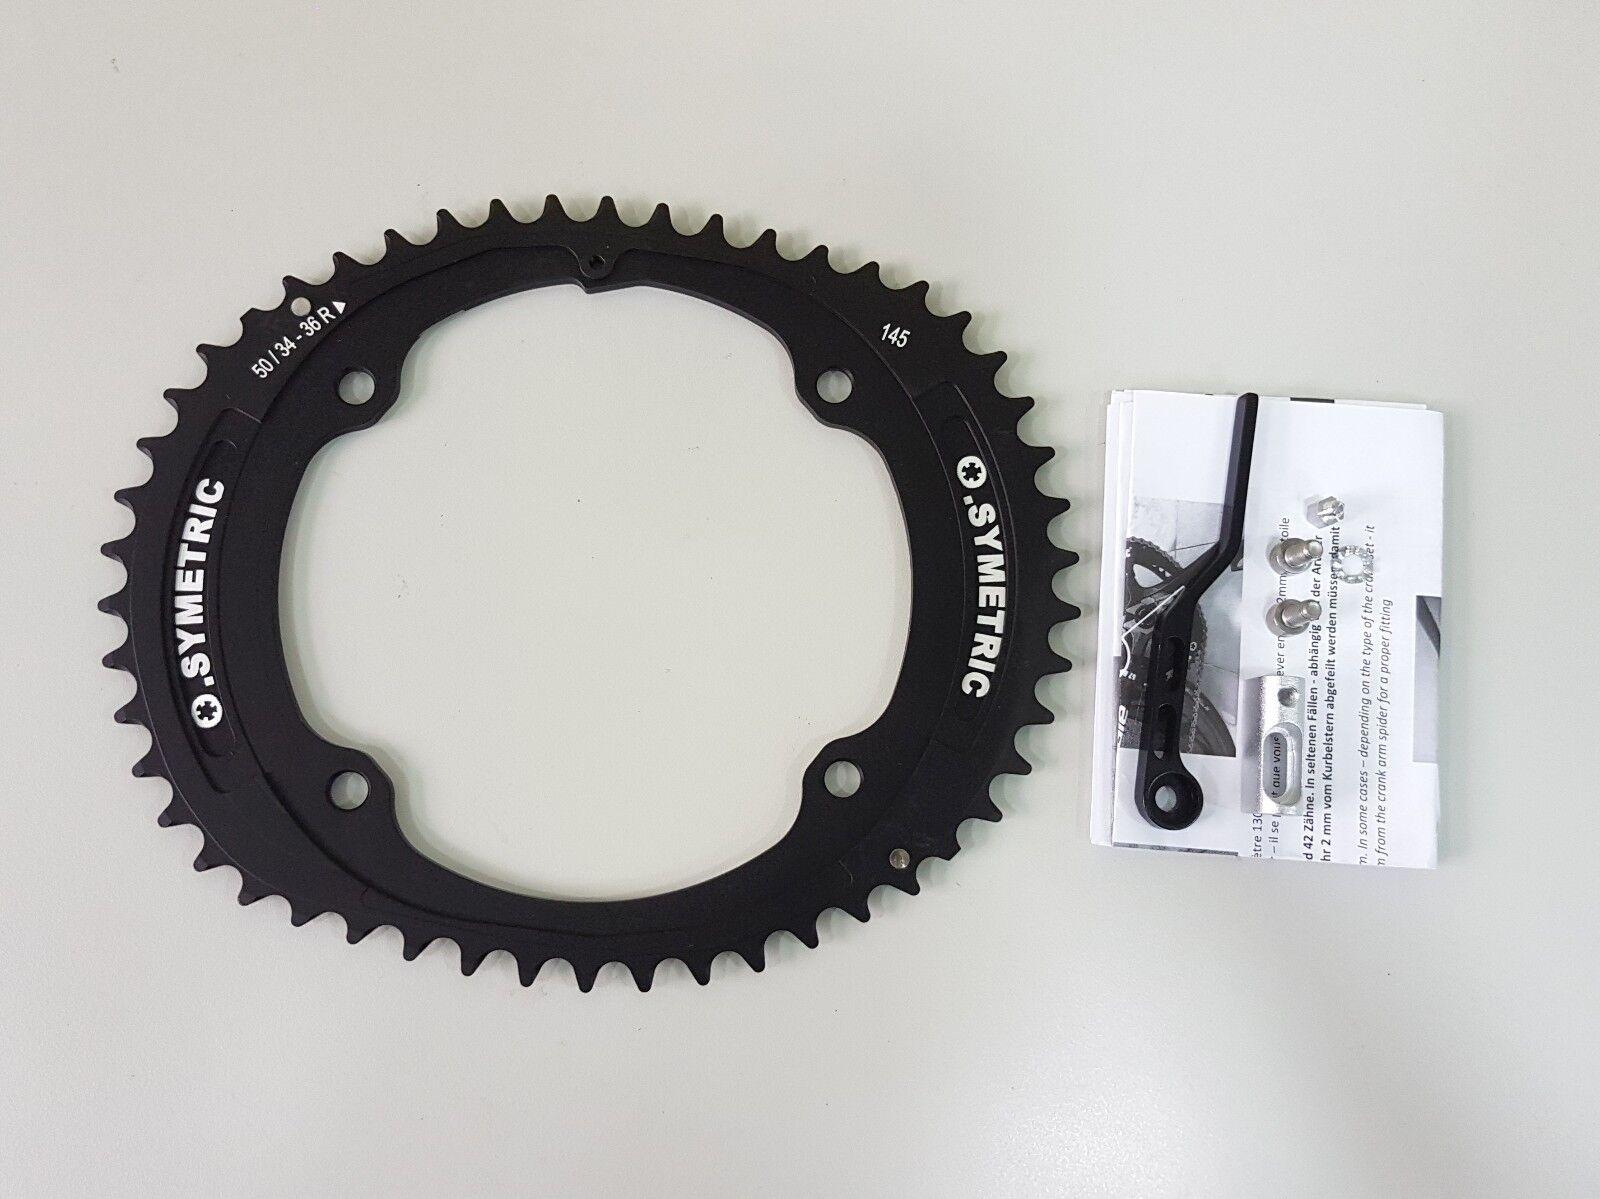 OSYMETRIC Bicicleta Plato BCD145x4 50 T Negro